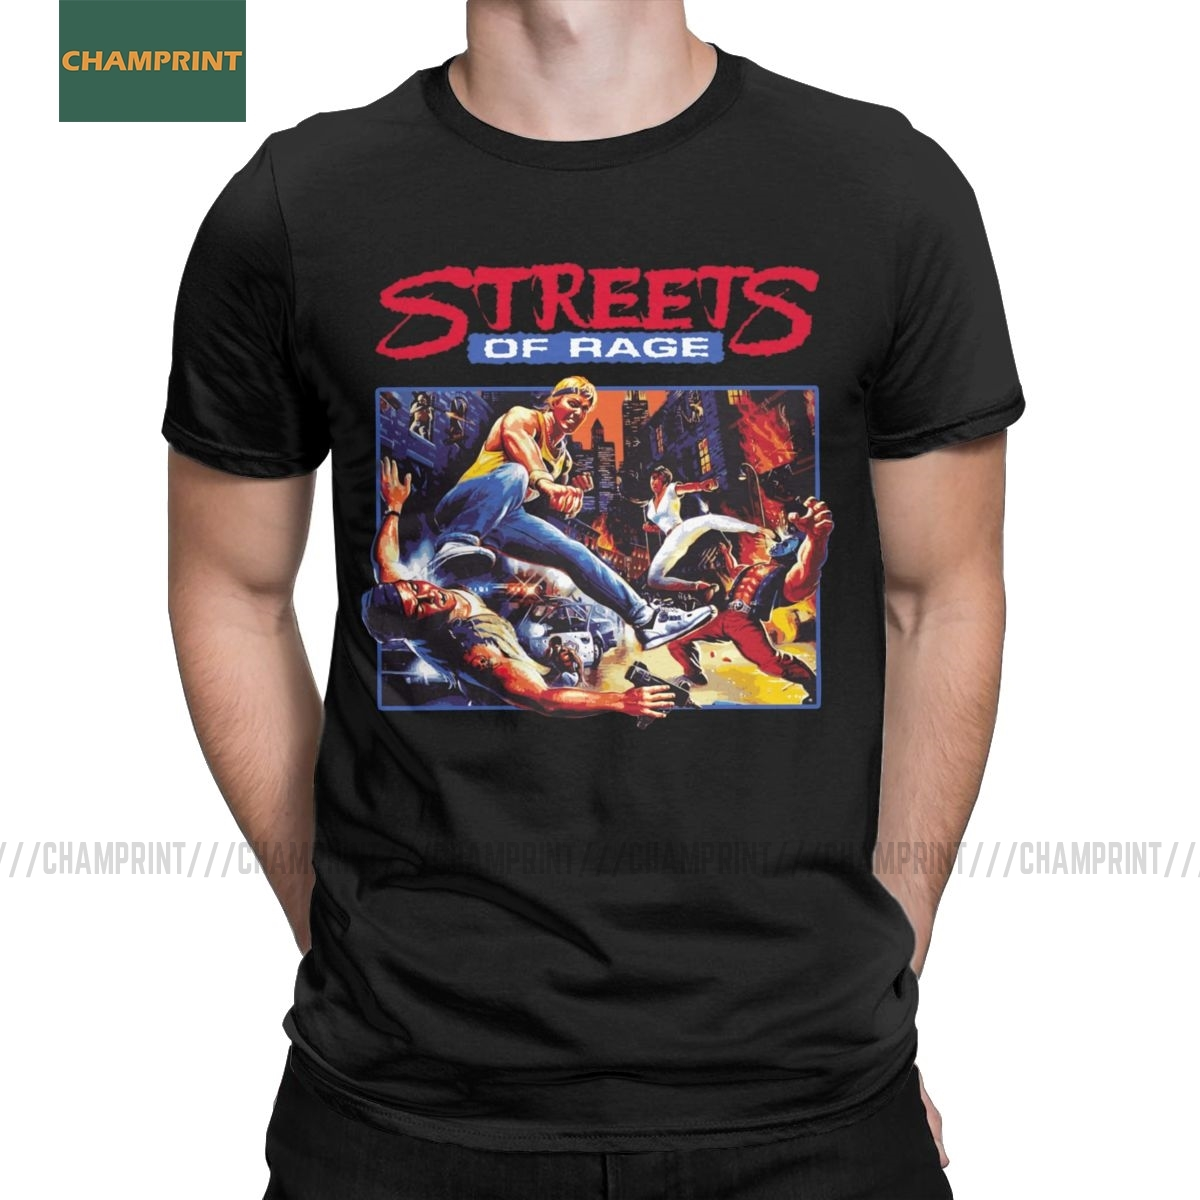 NEW RETRO STREETS OF RAGE 2 T-SHIRT SIZES S M L XL XXL+